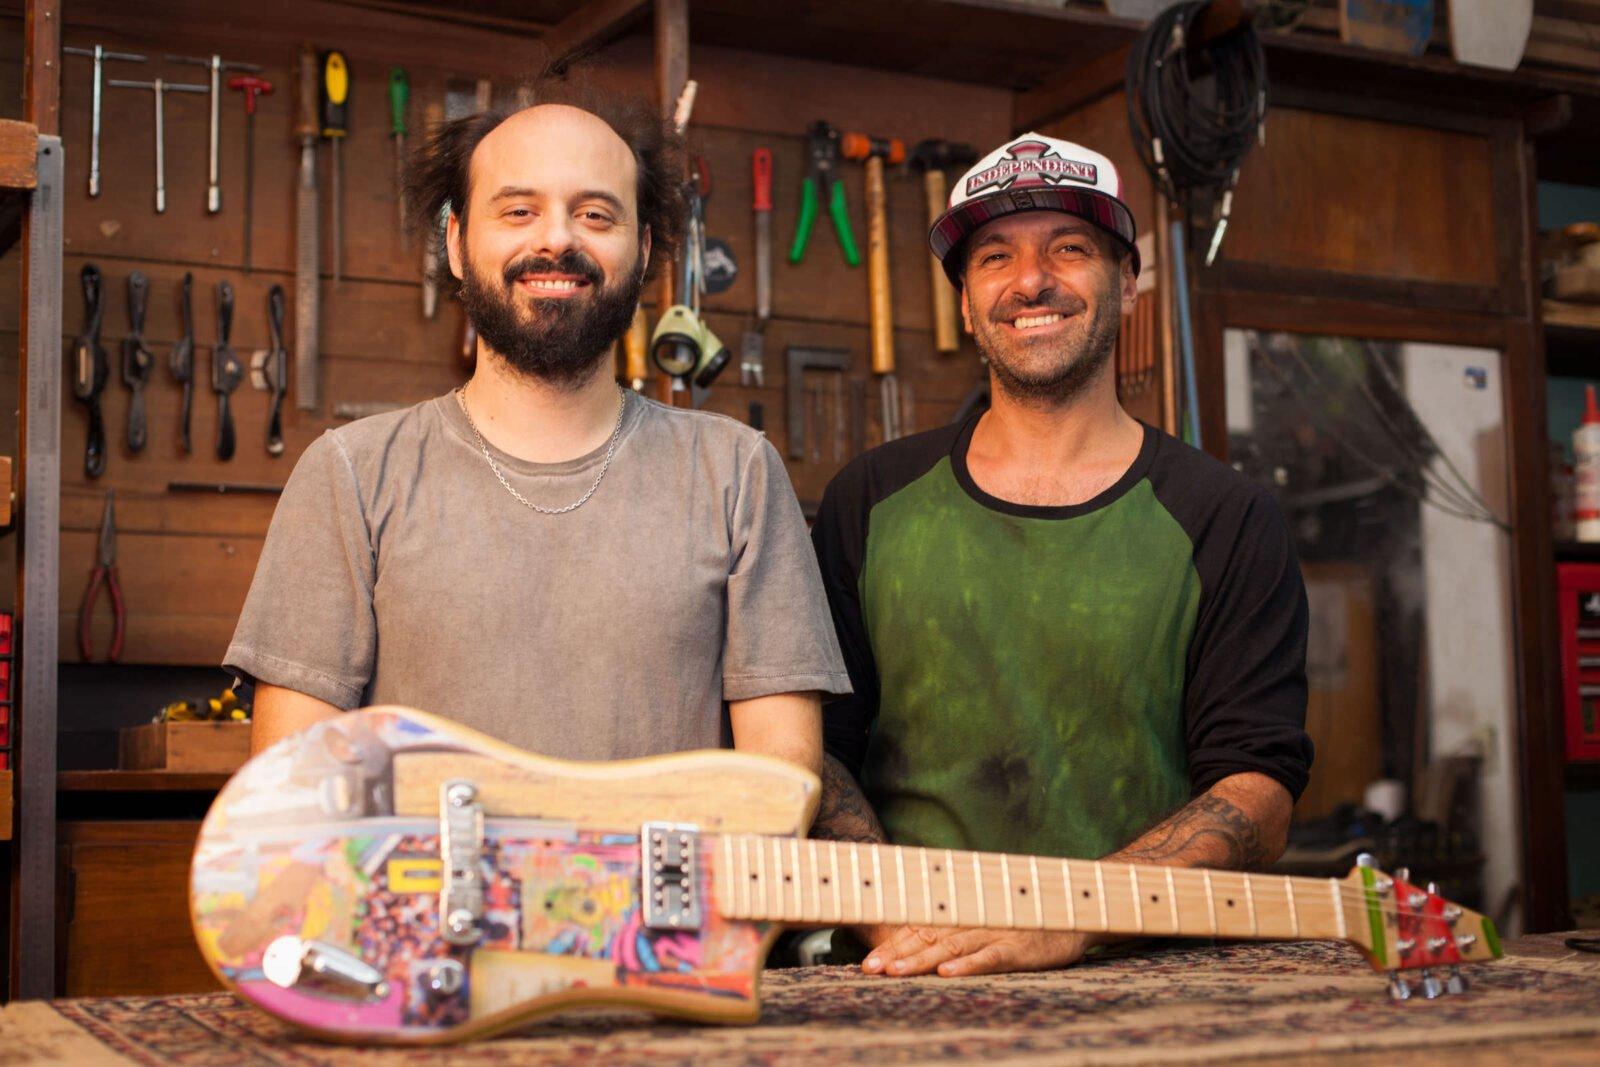 Musk Skateboard Guitars Team 1 1600x1067 - Musk Skateboard Guitars